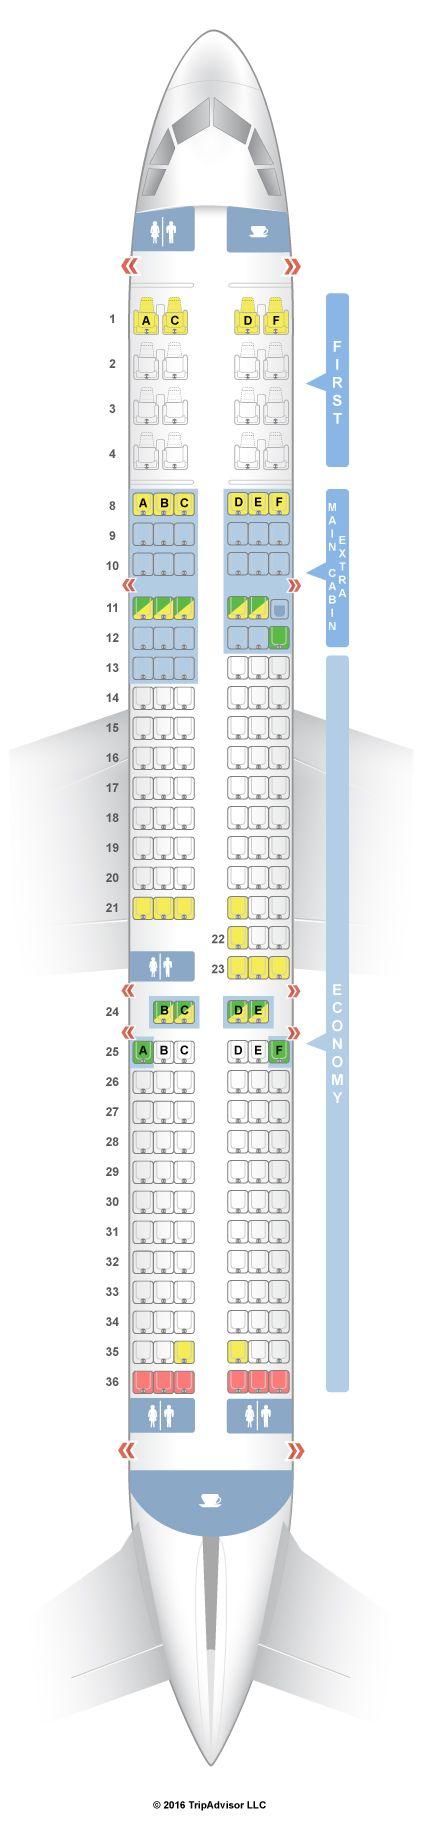 SeatGuru Seat Map American Airlines Airbus A321 (32B) V2